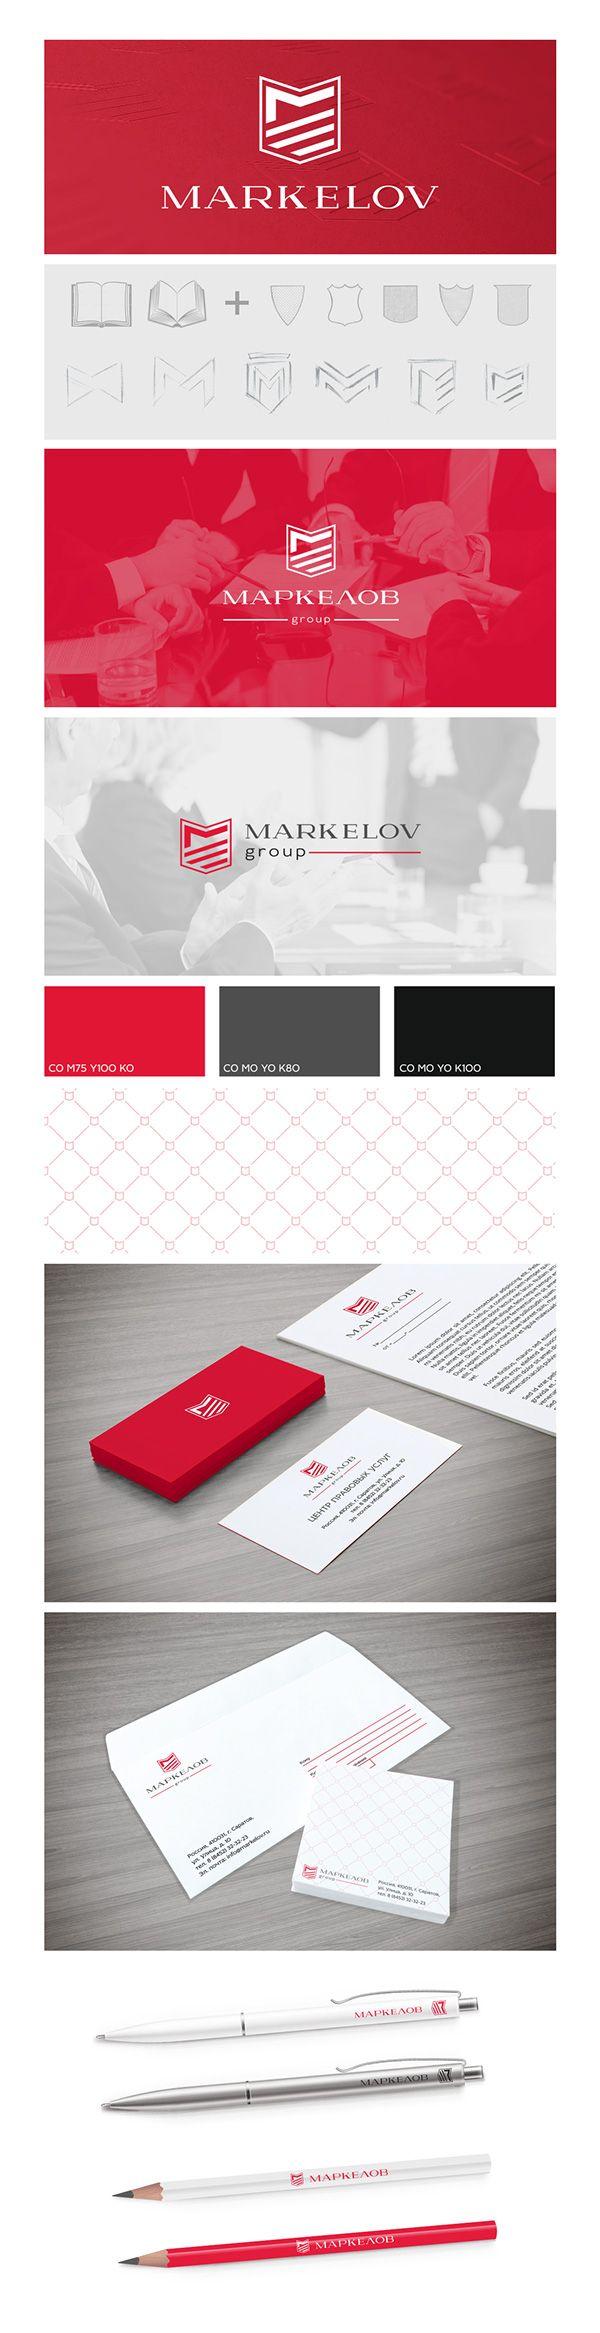 Branding/Corporate Identity Markelov group  - Lawyers